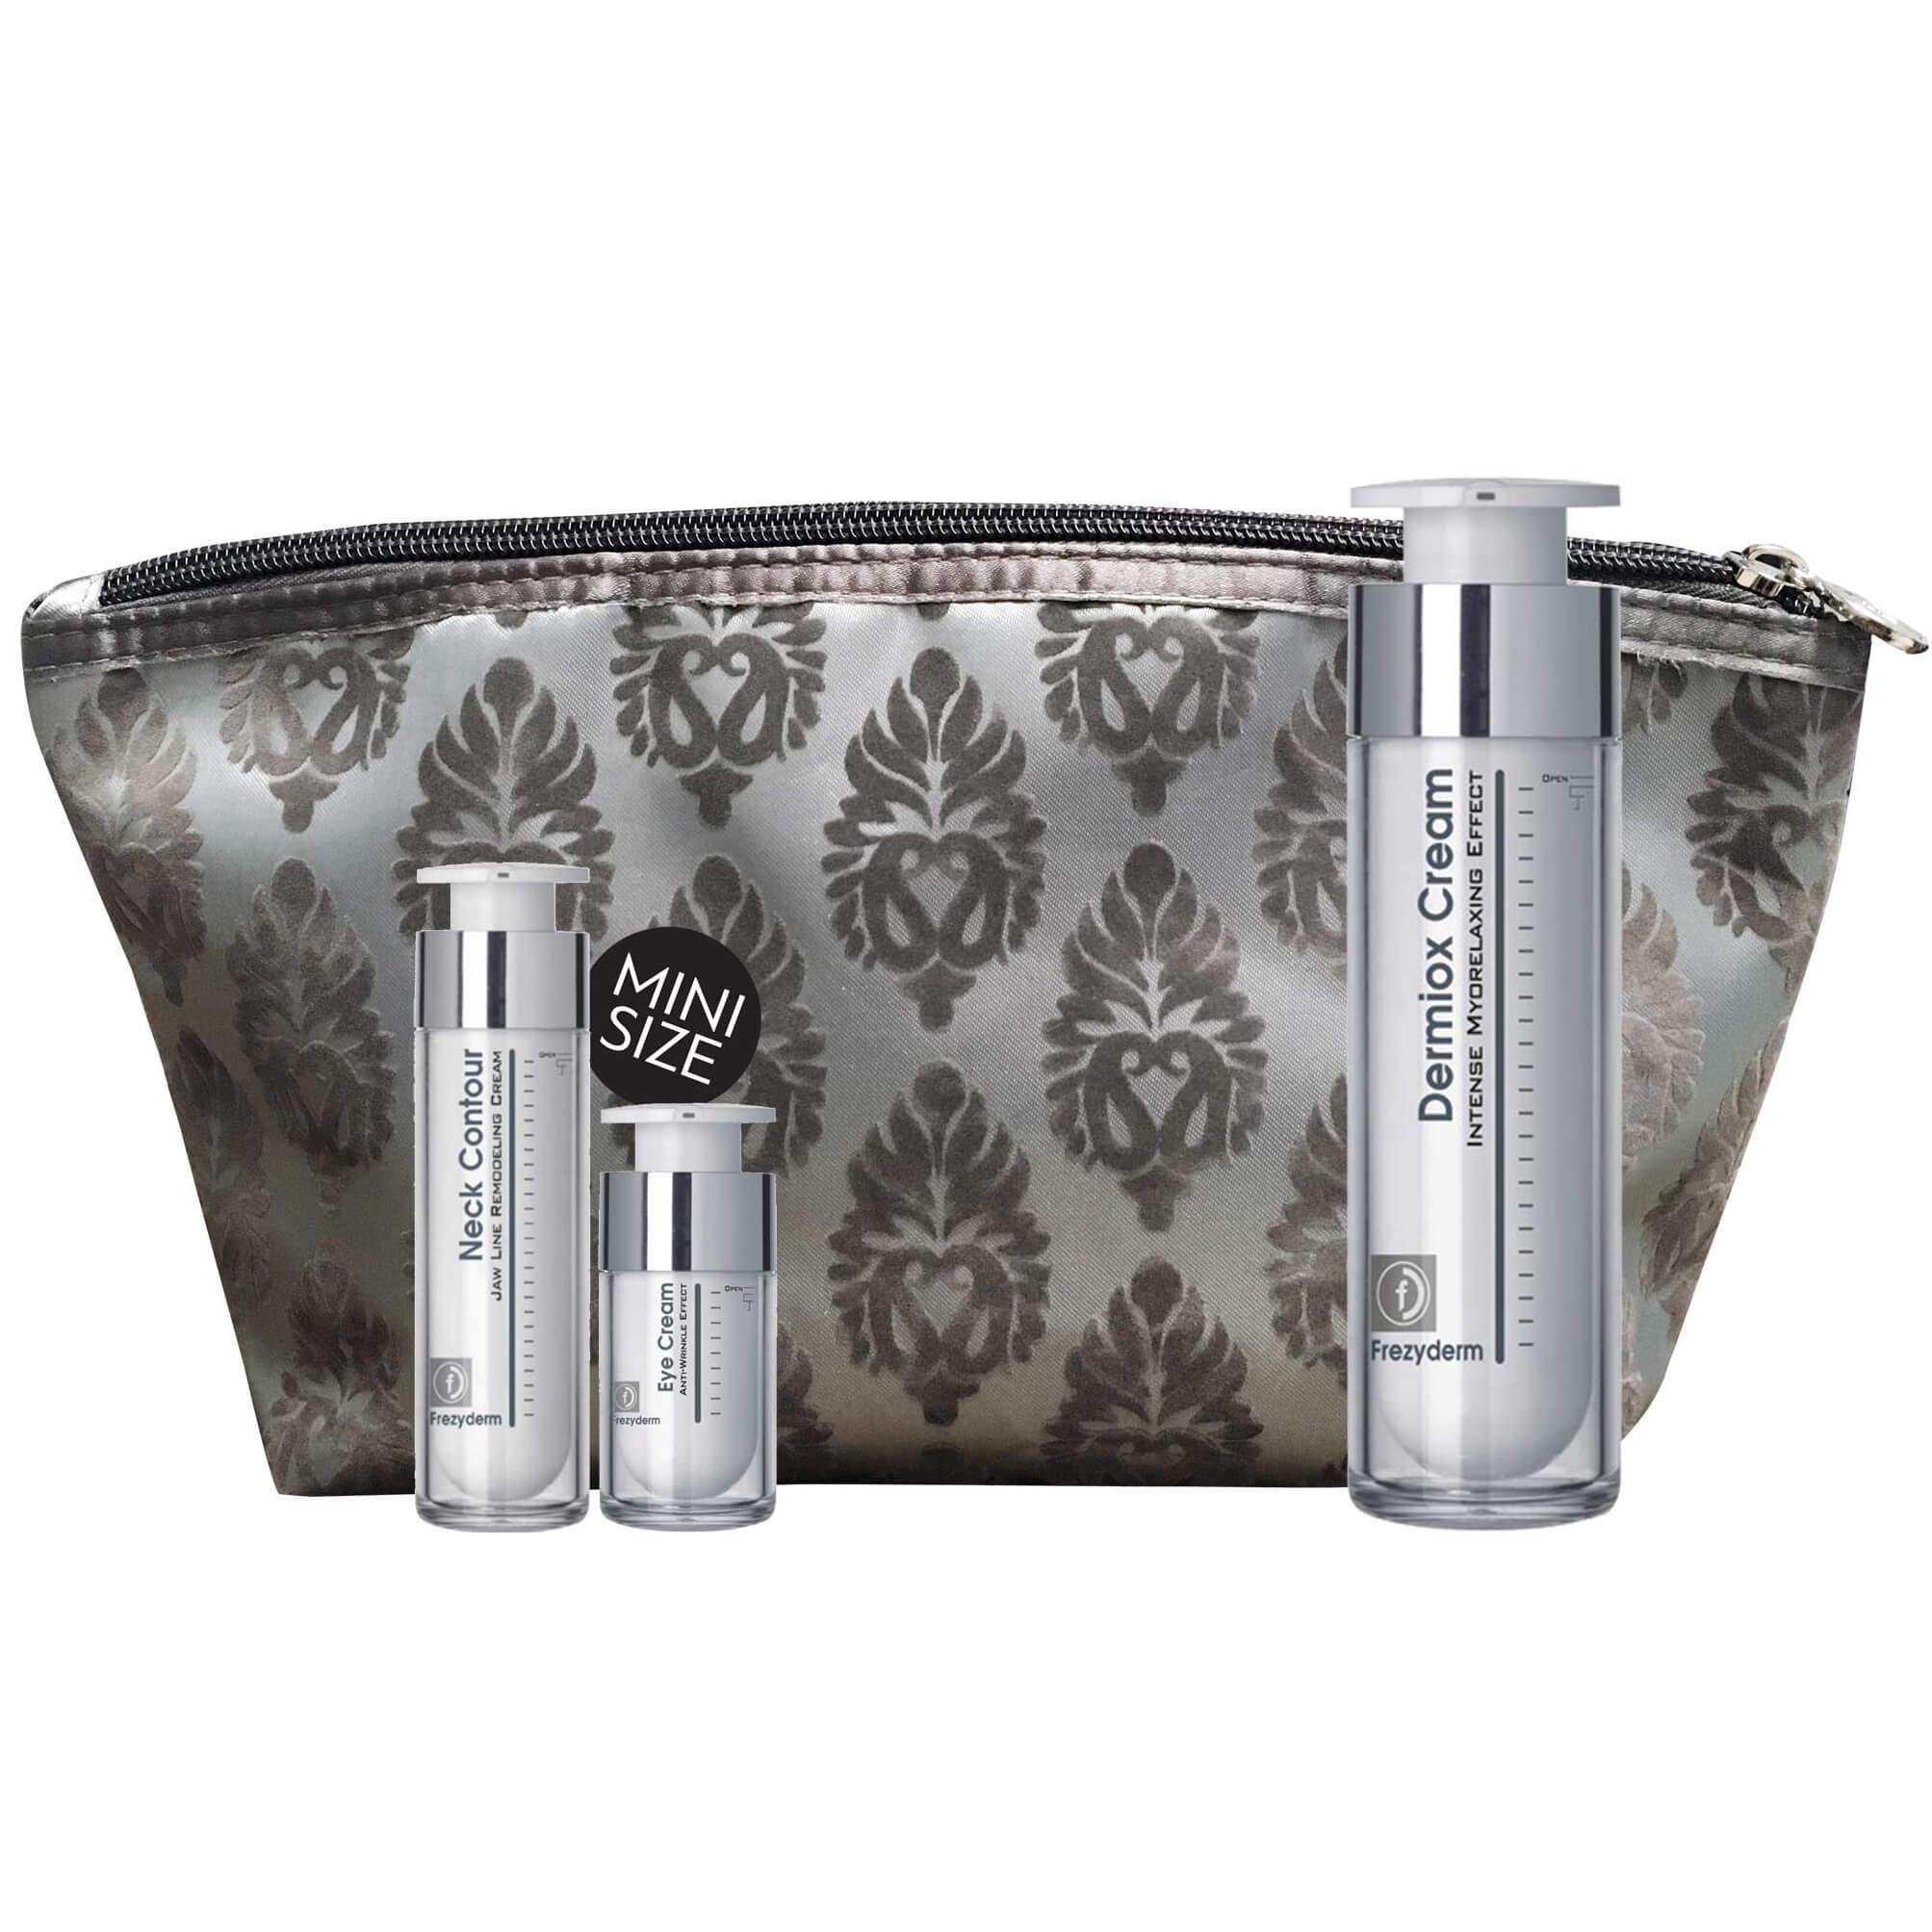 Frezyderm Πακέτο Προσφοράς Dermiox Cream 50ml & Δώρο Neck Contour Cream 15ml & Eye Cream 5ml & Νεσεσέρ